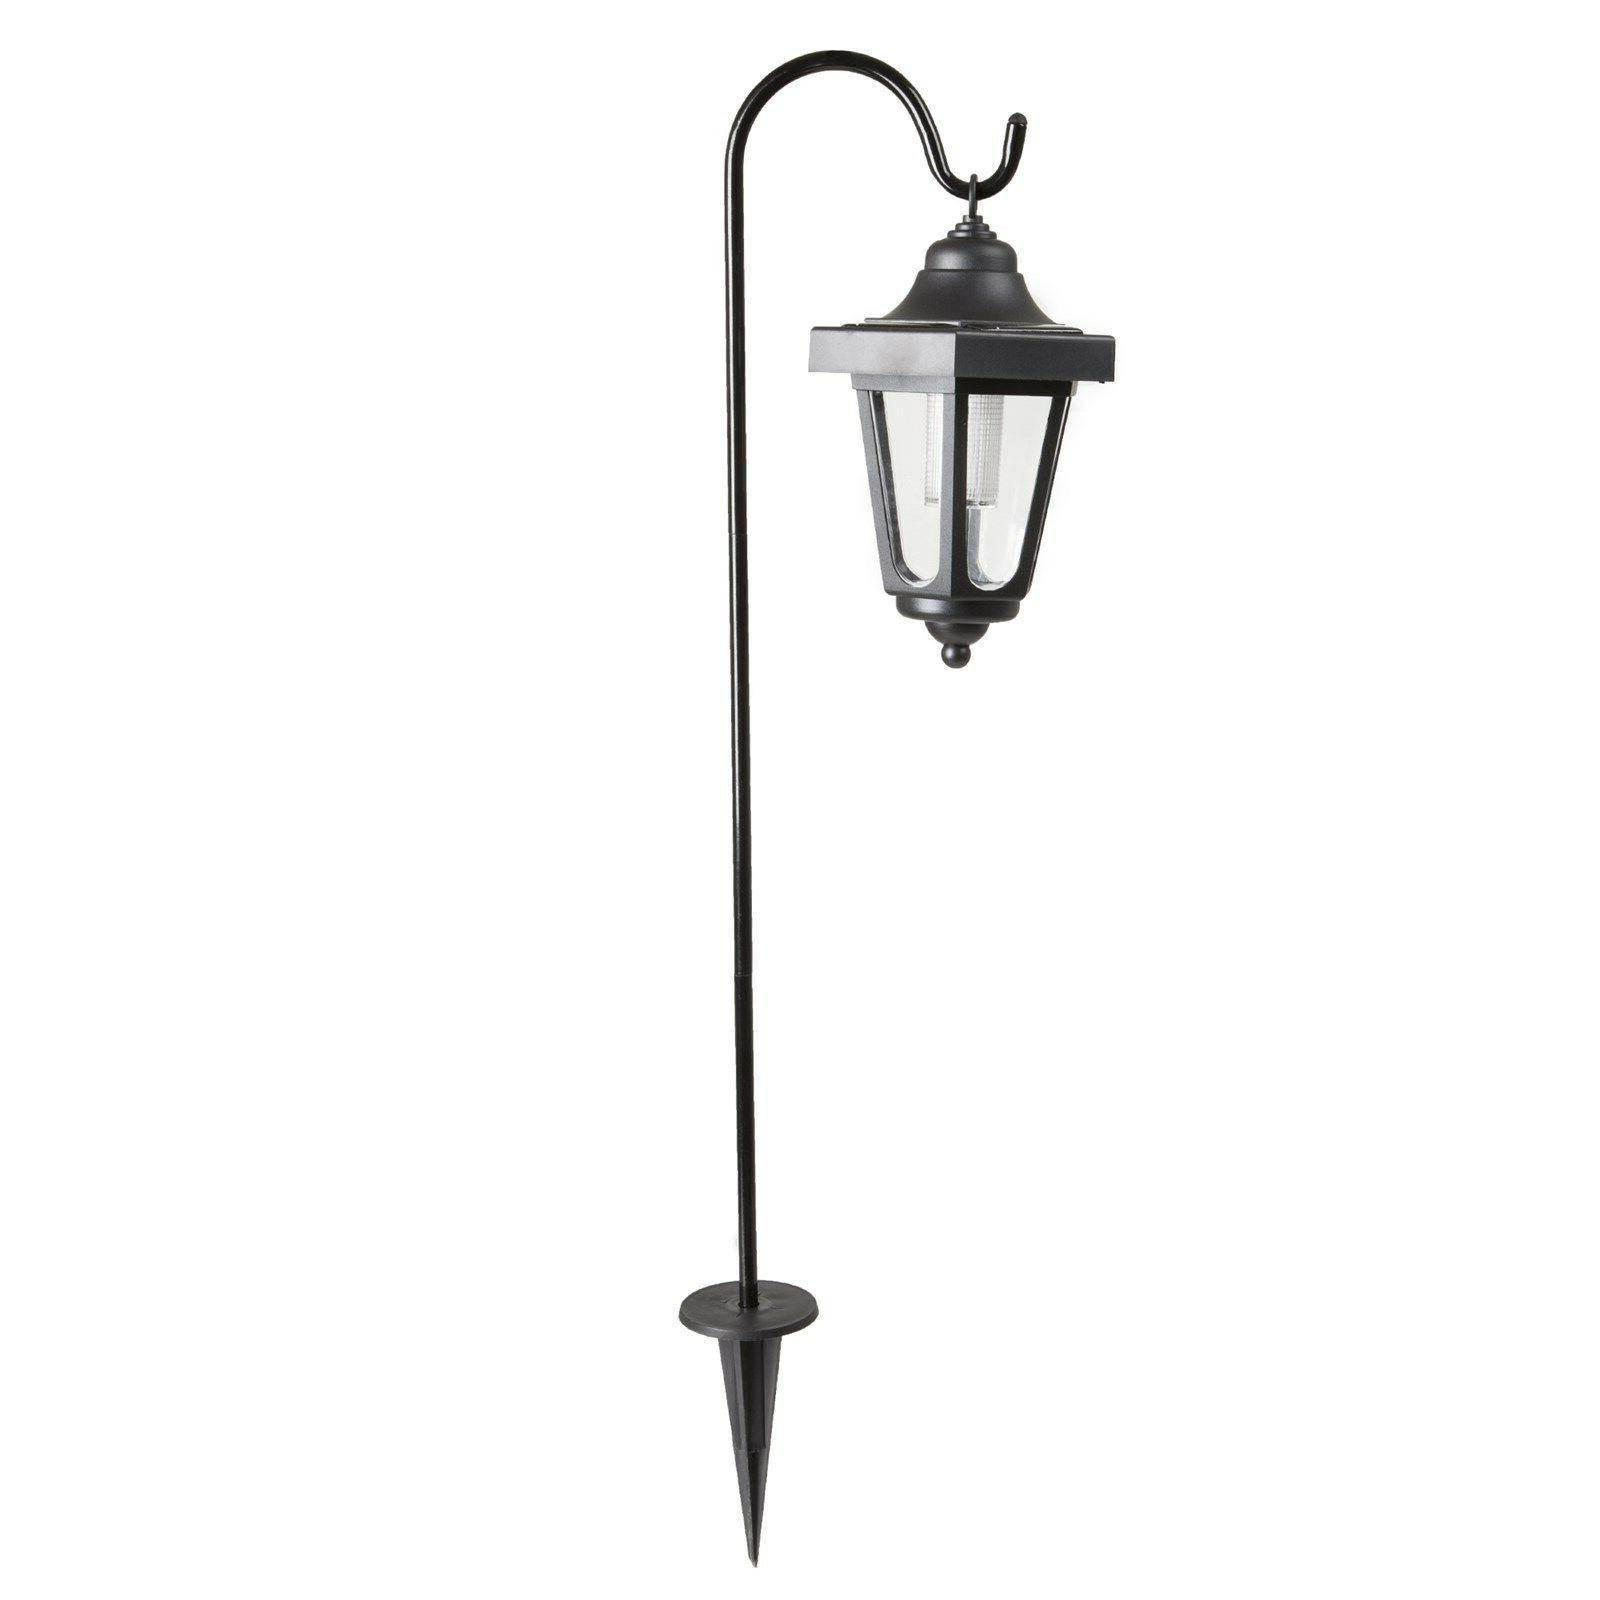 Pure of LED Hanging Coach Lanterns